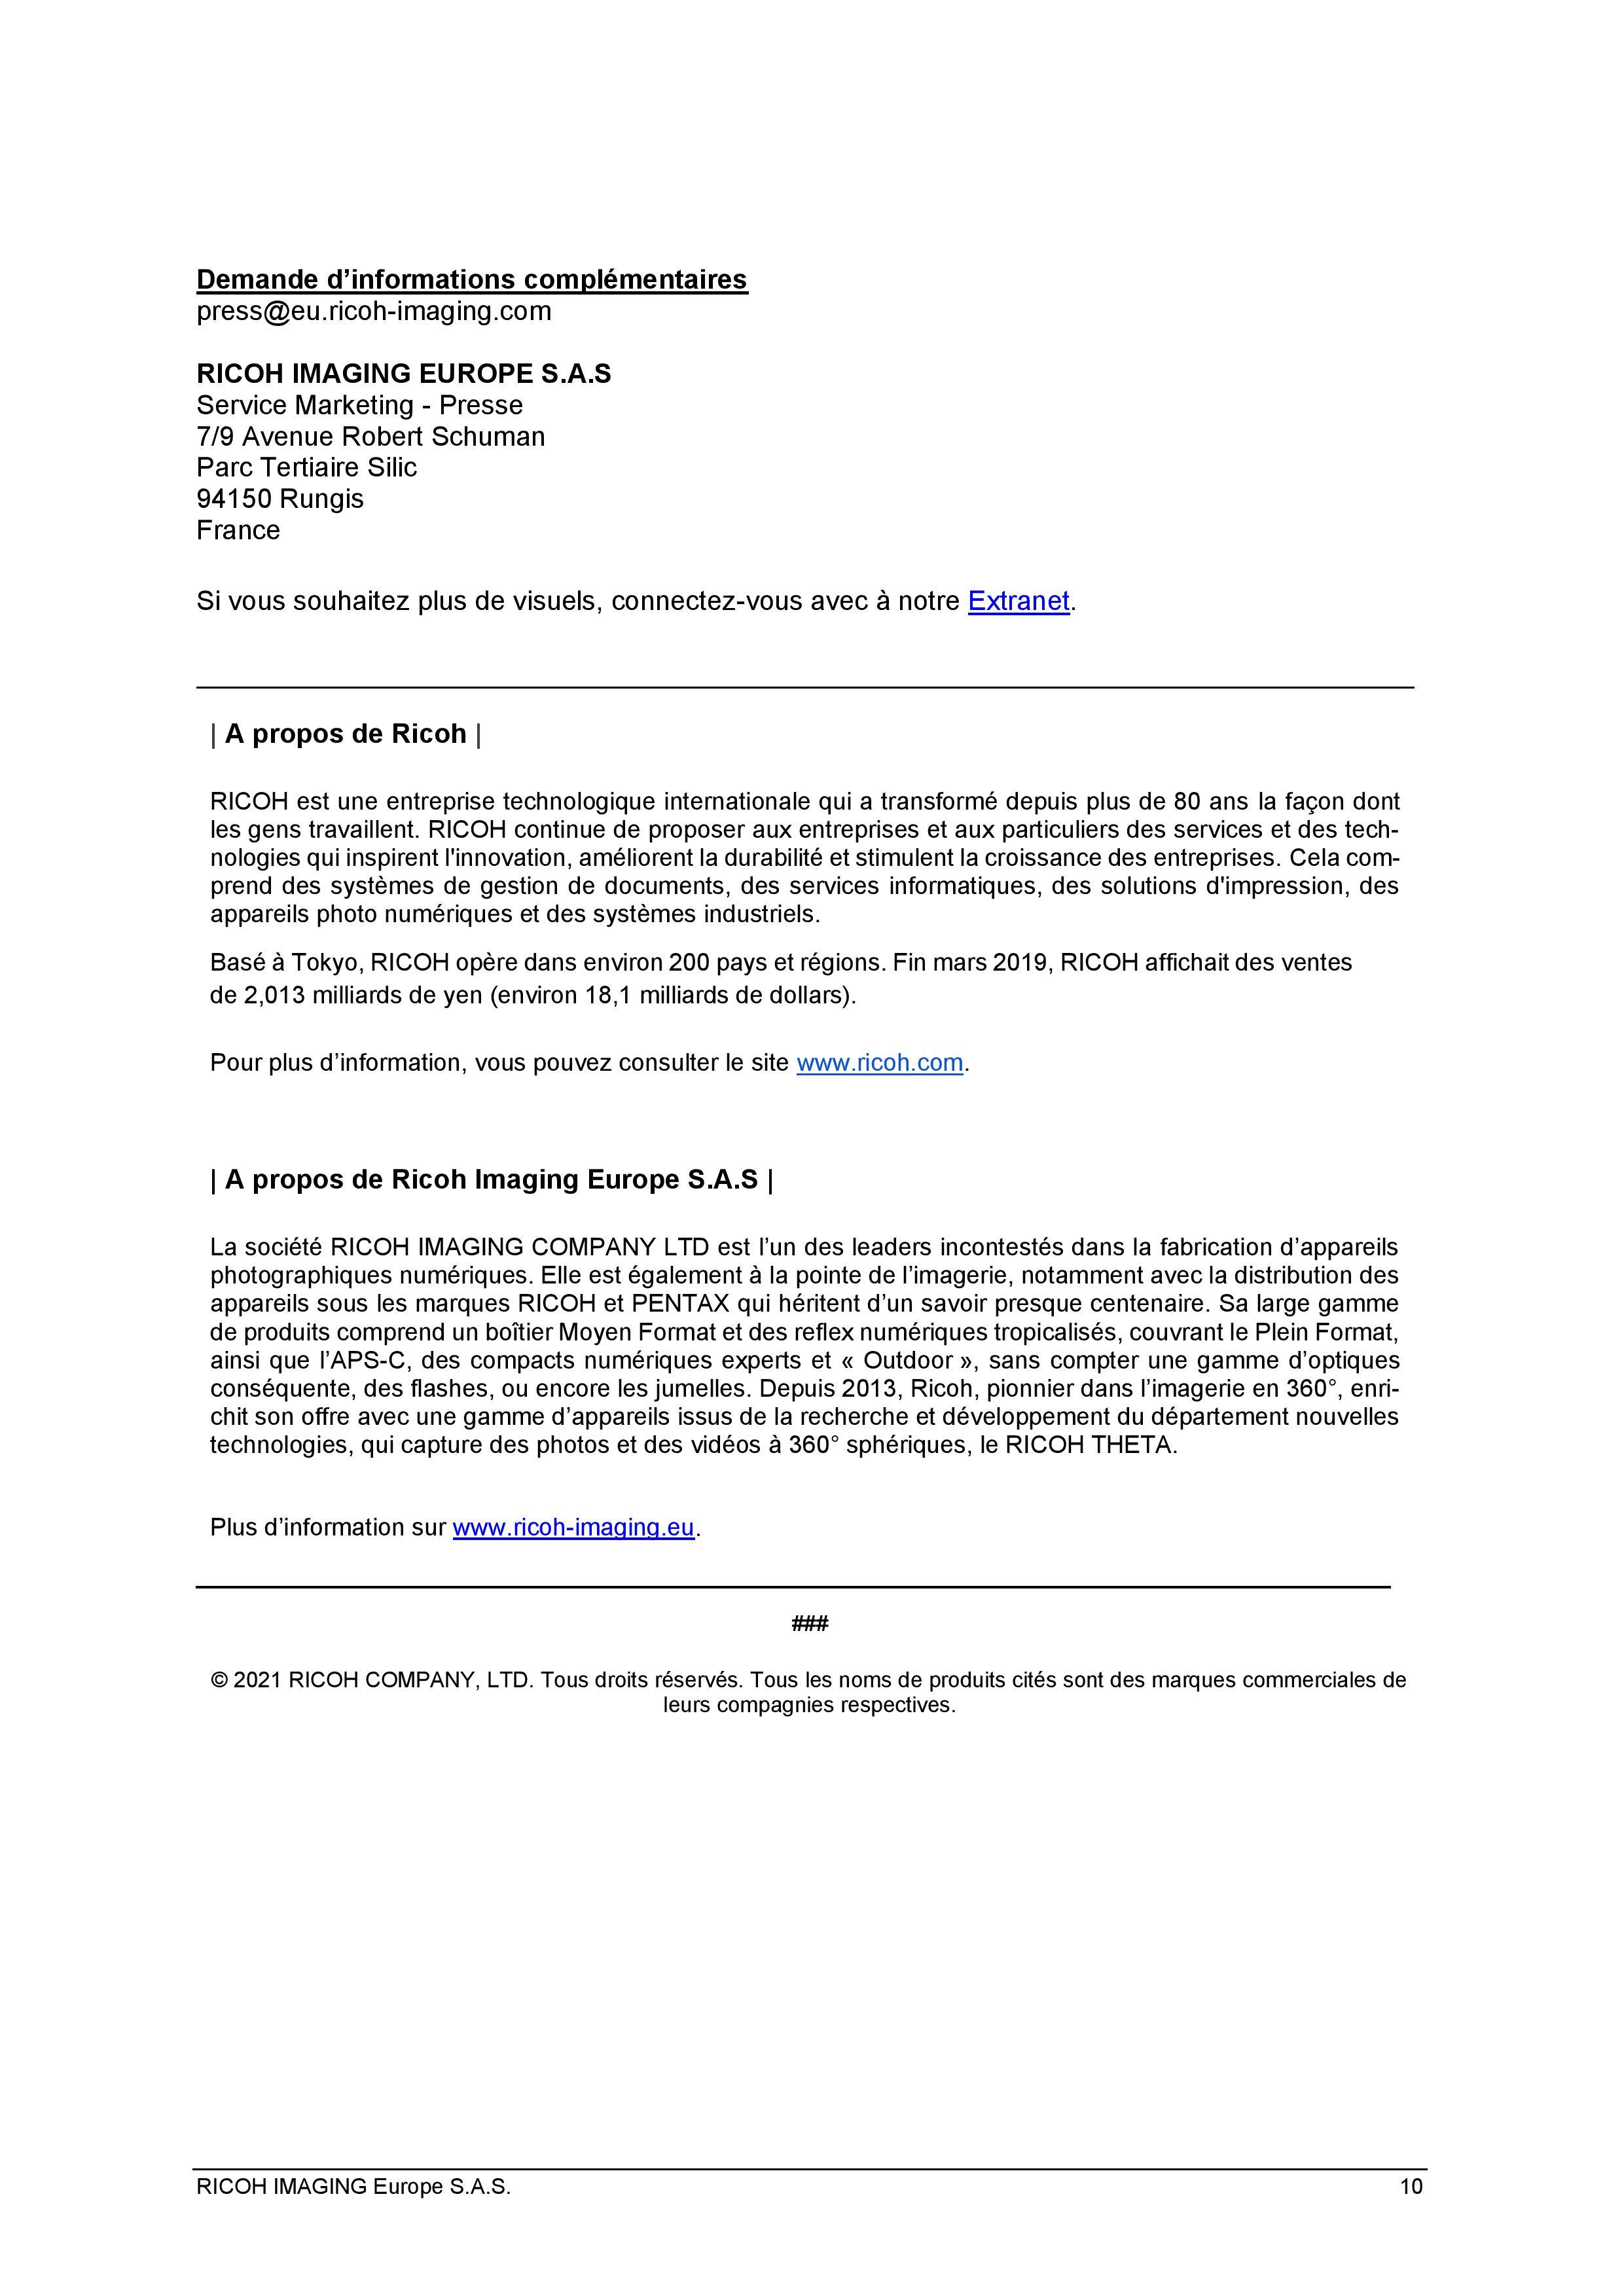 PENTAX RICOH IMAGING - Communiqué de presse du K3 Mark III 21033103161523142217344196